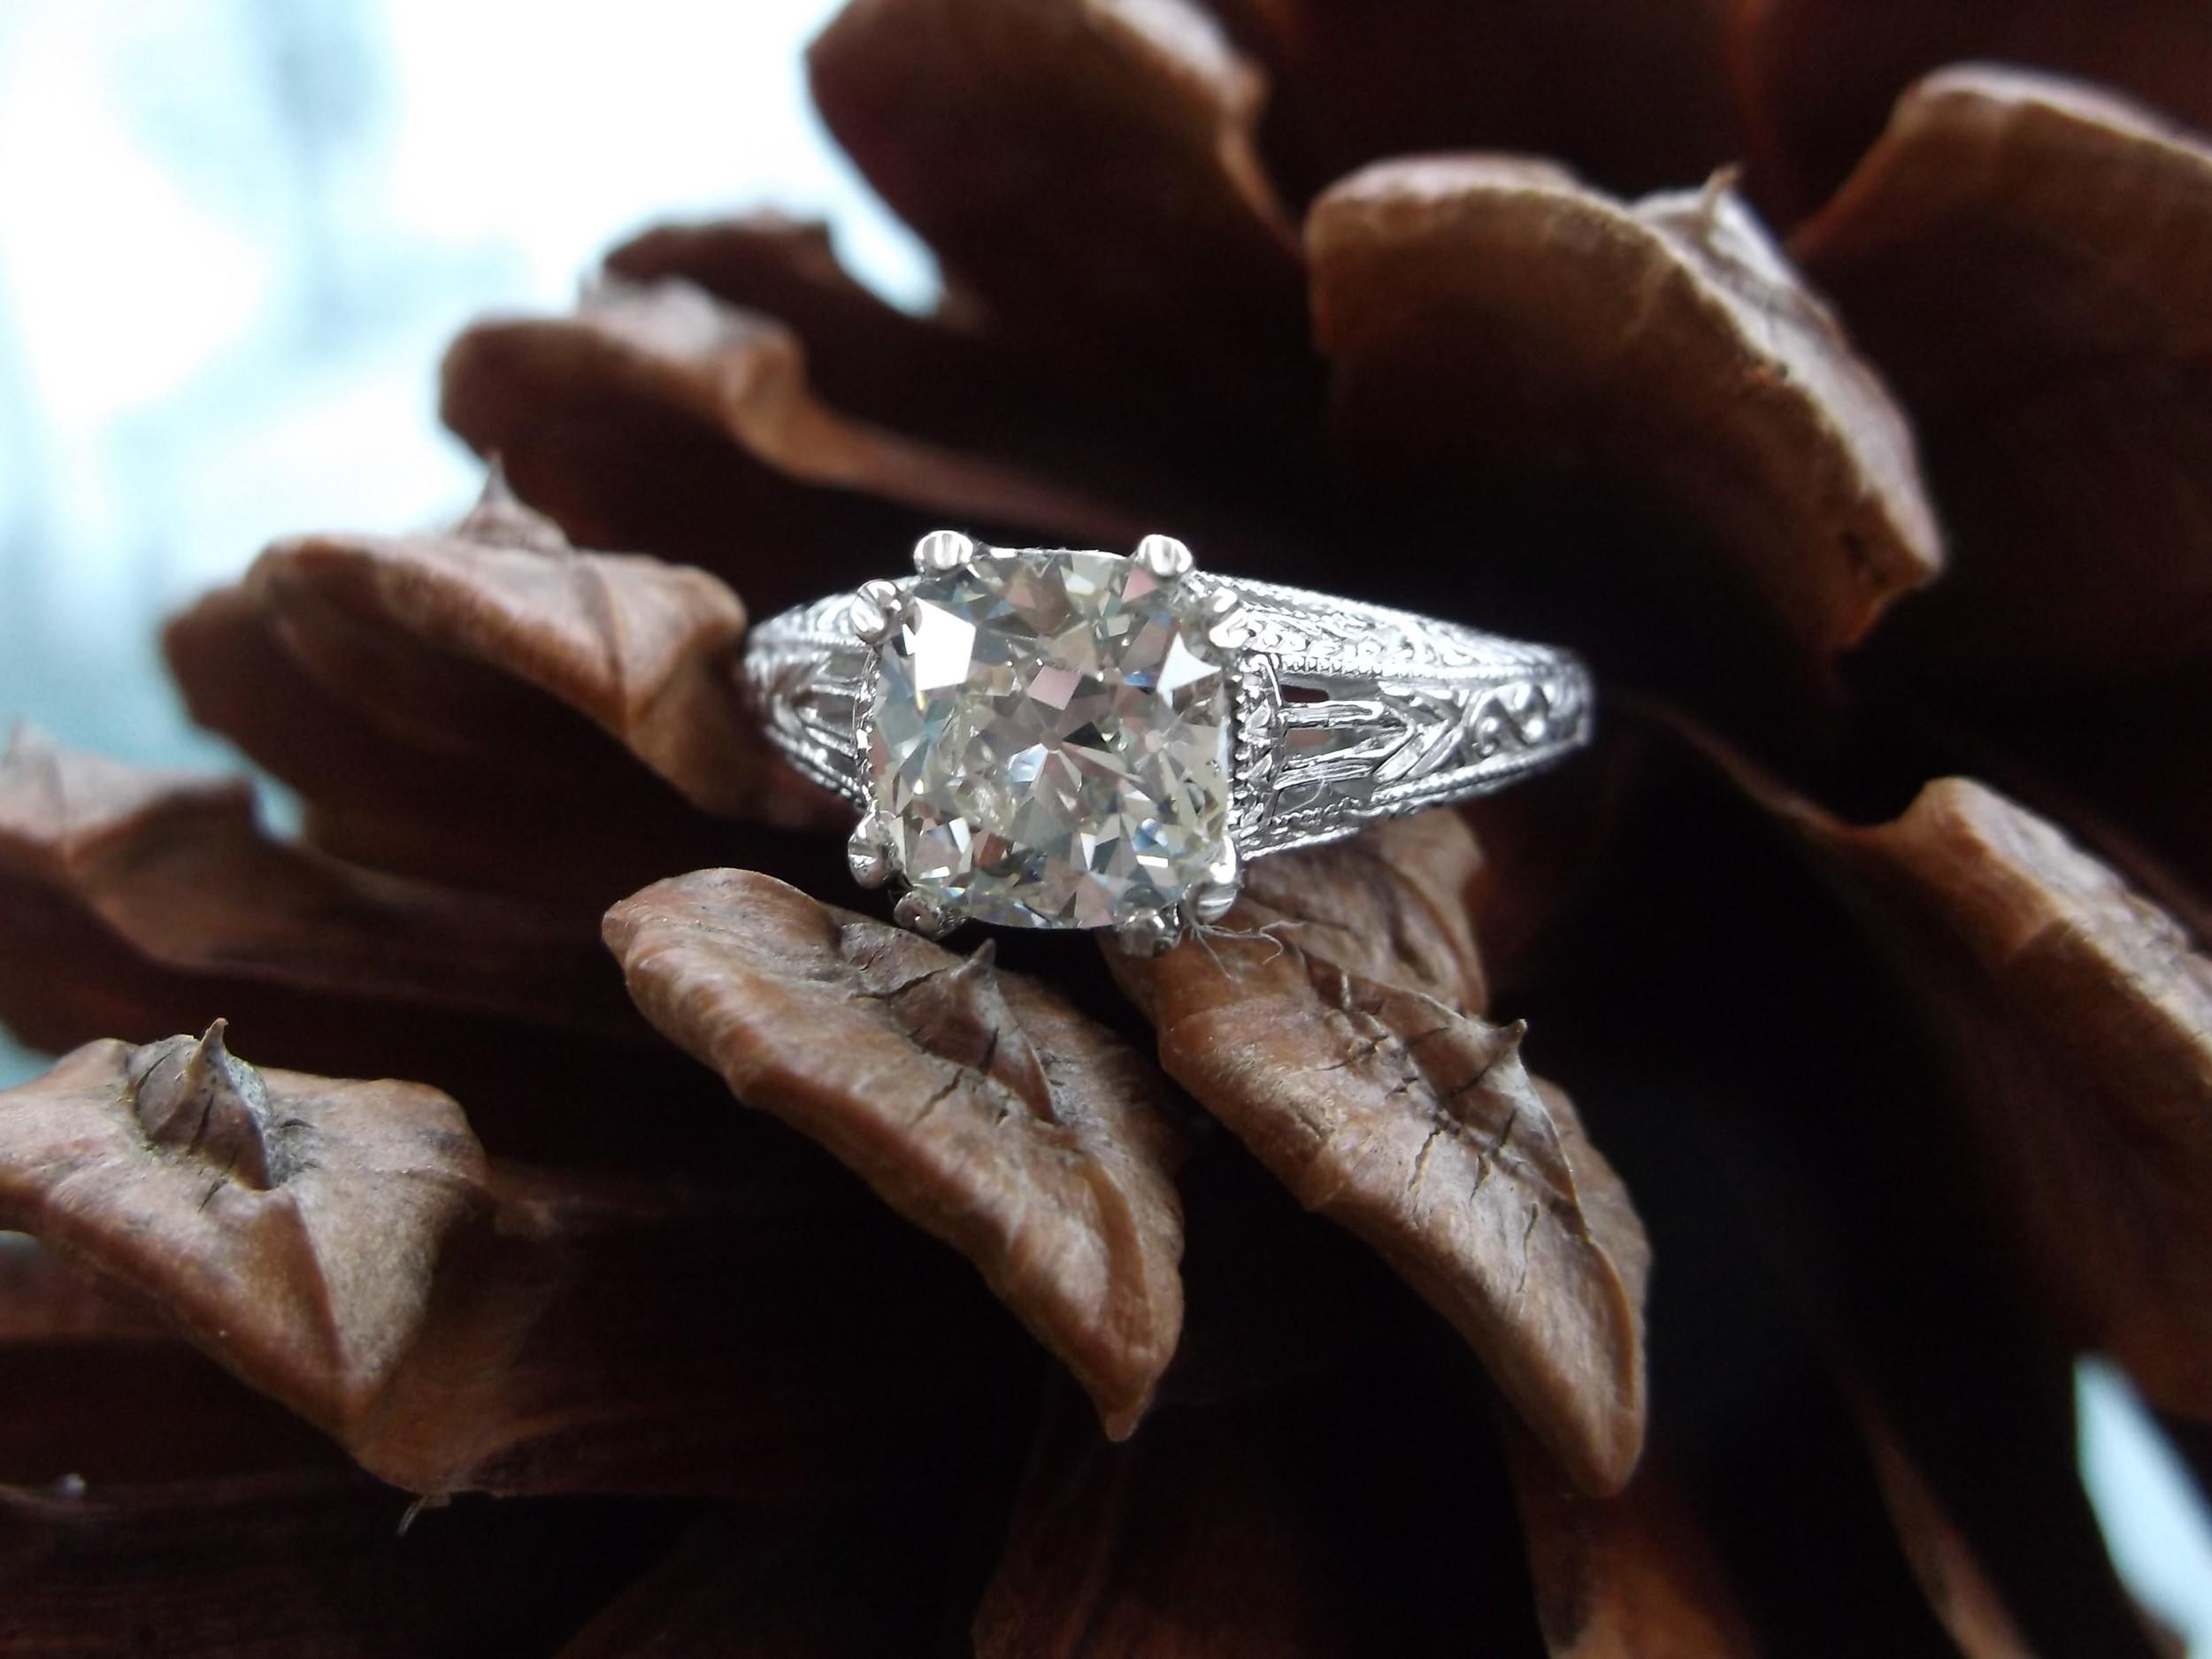 SOLD - Elegant 1.27 carat Old Mine cut diamond set in a beautiful white gold filigree setting.